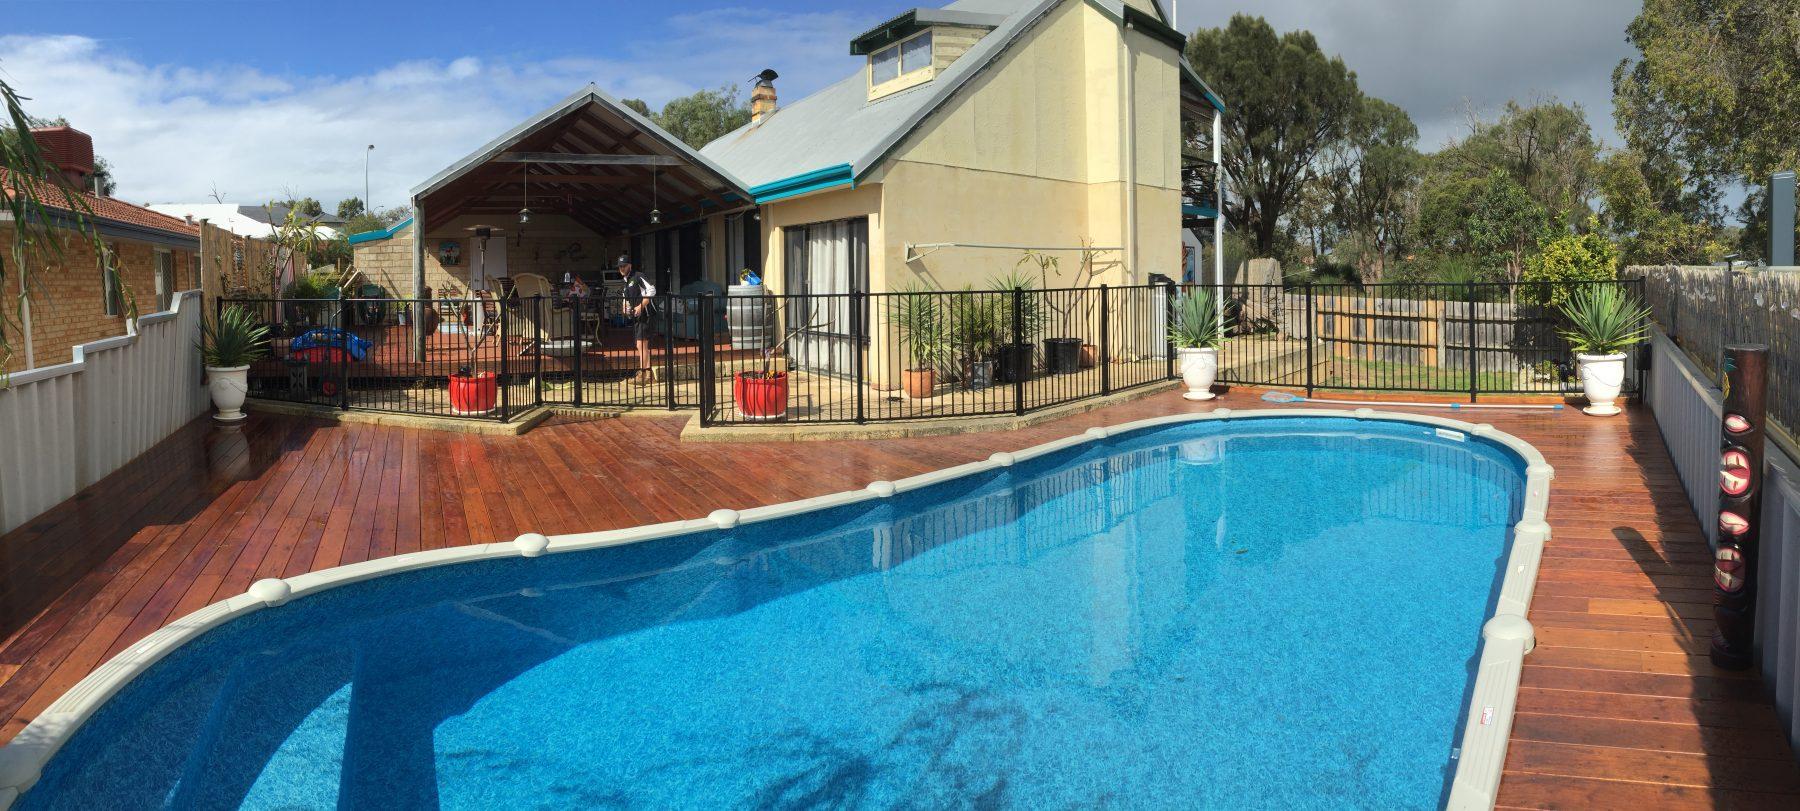 Timber pool deck